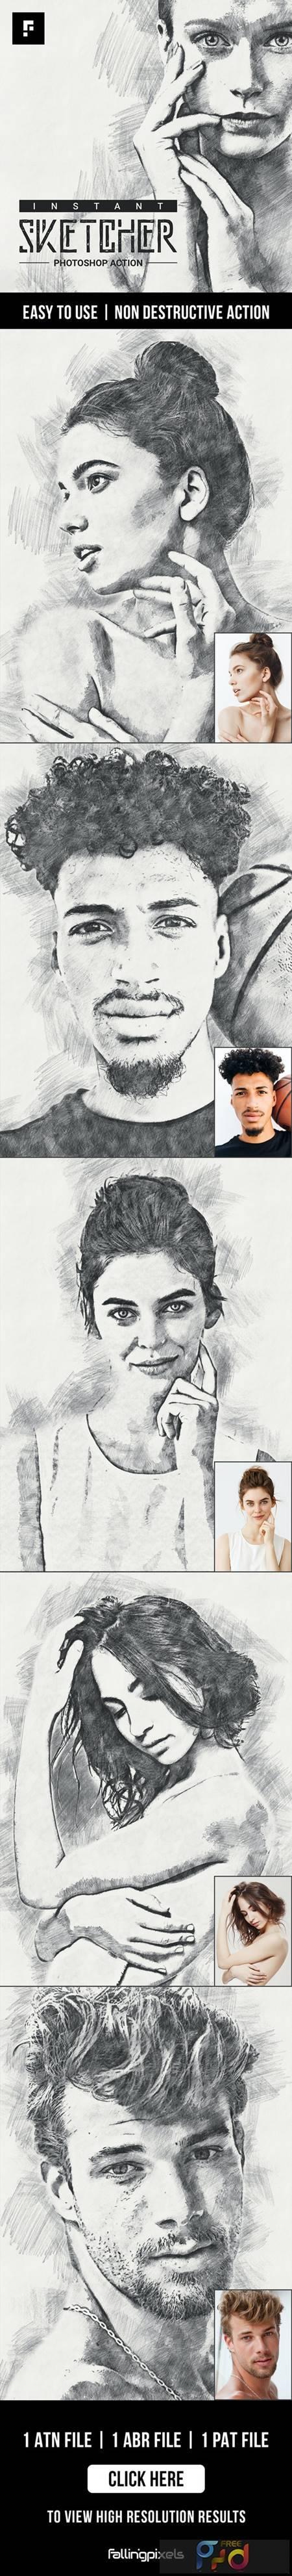 Instant Sketcher Photoshop Action 27659405 1